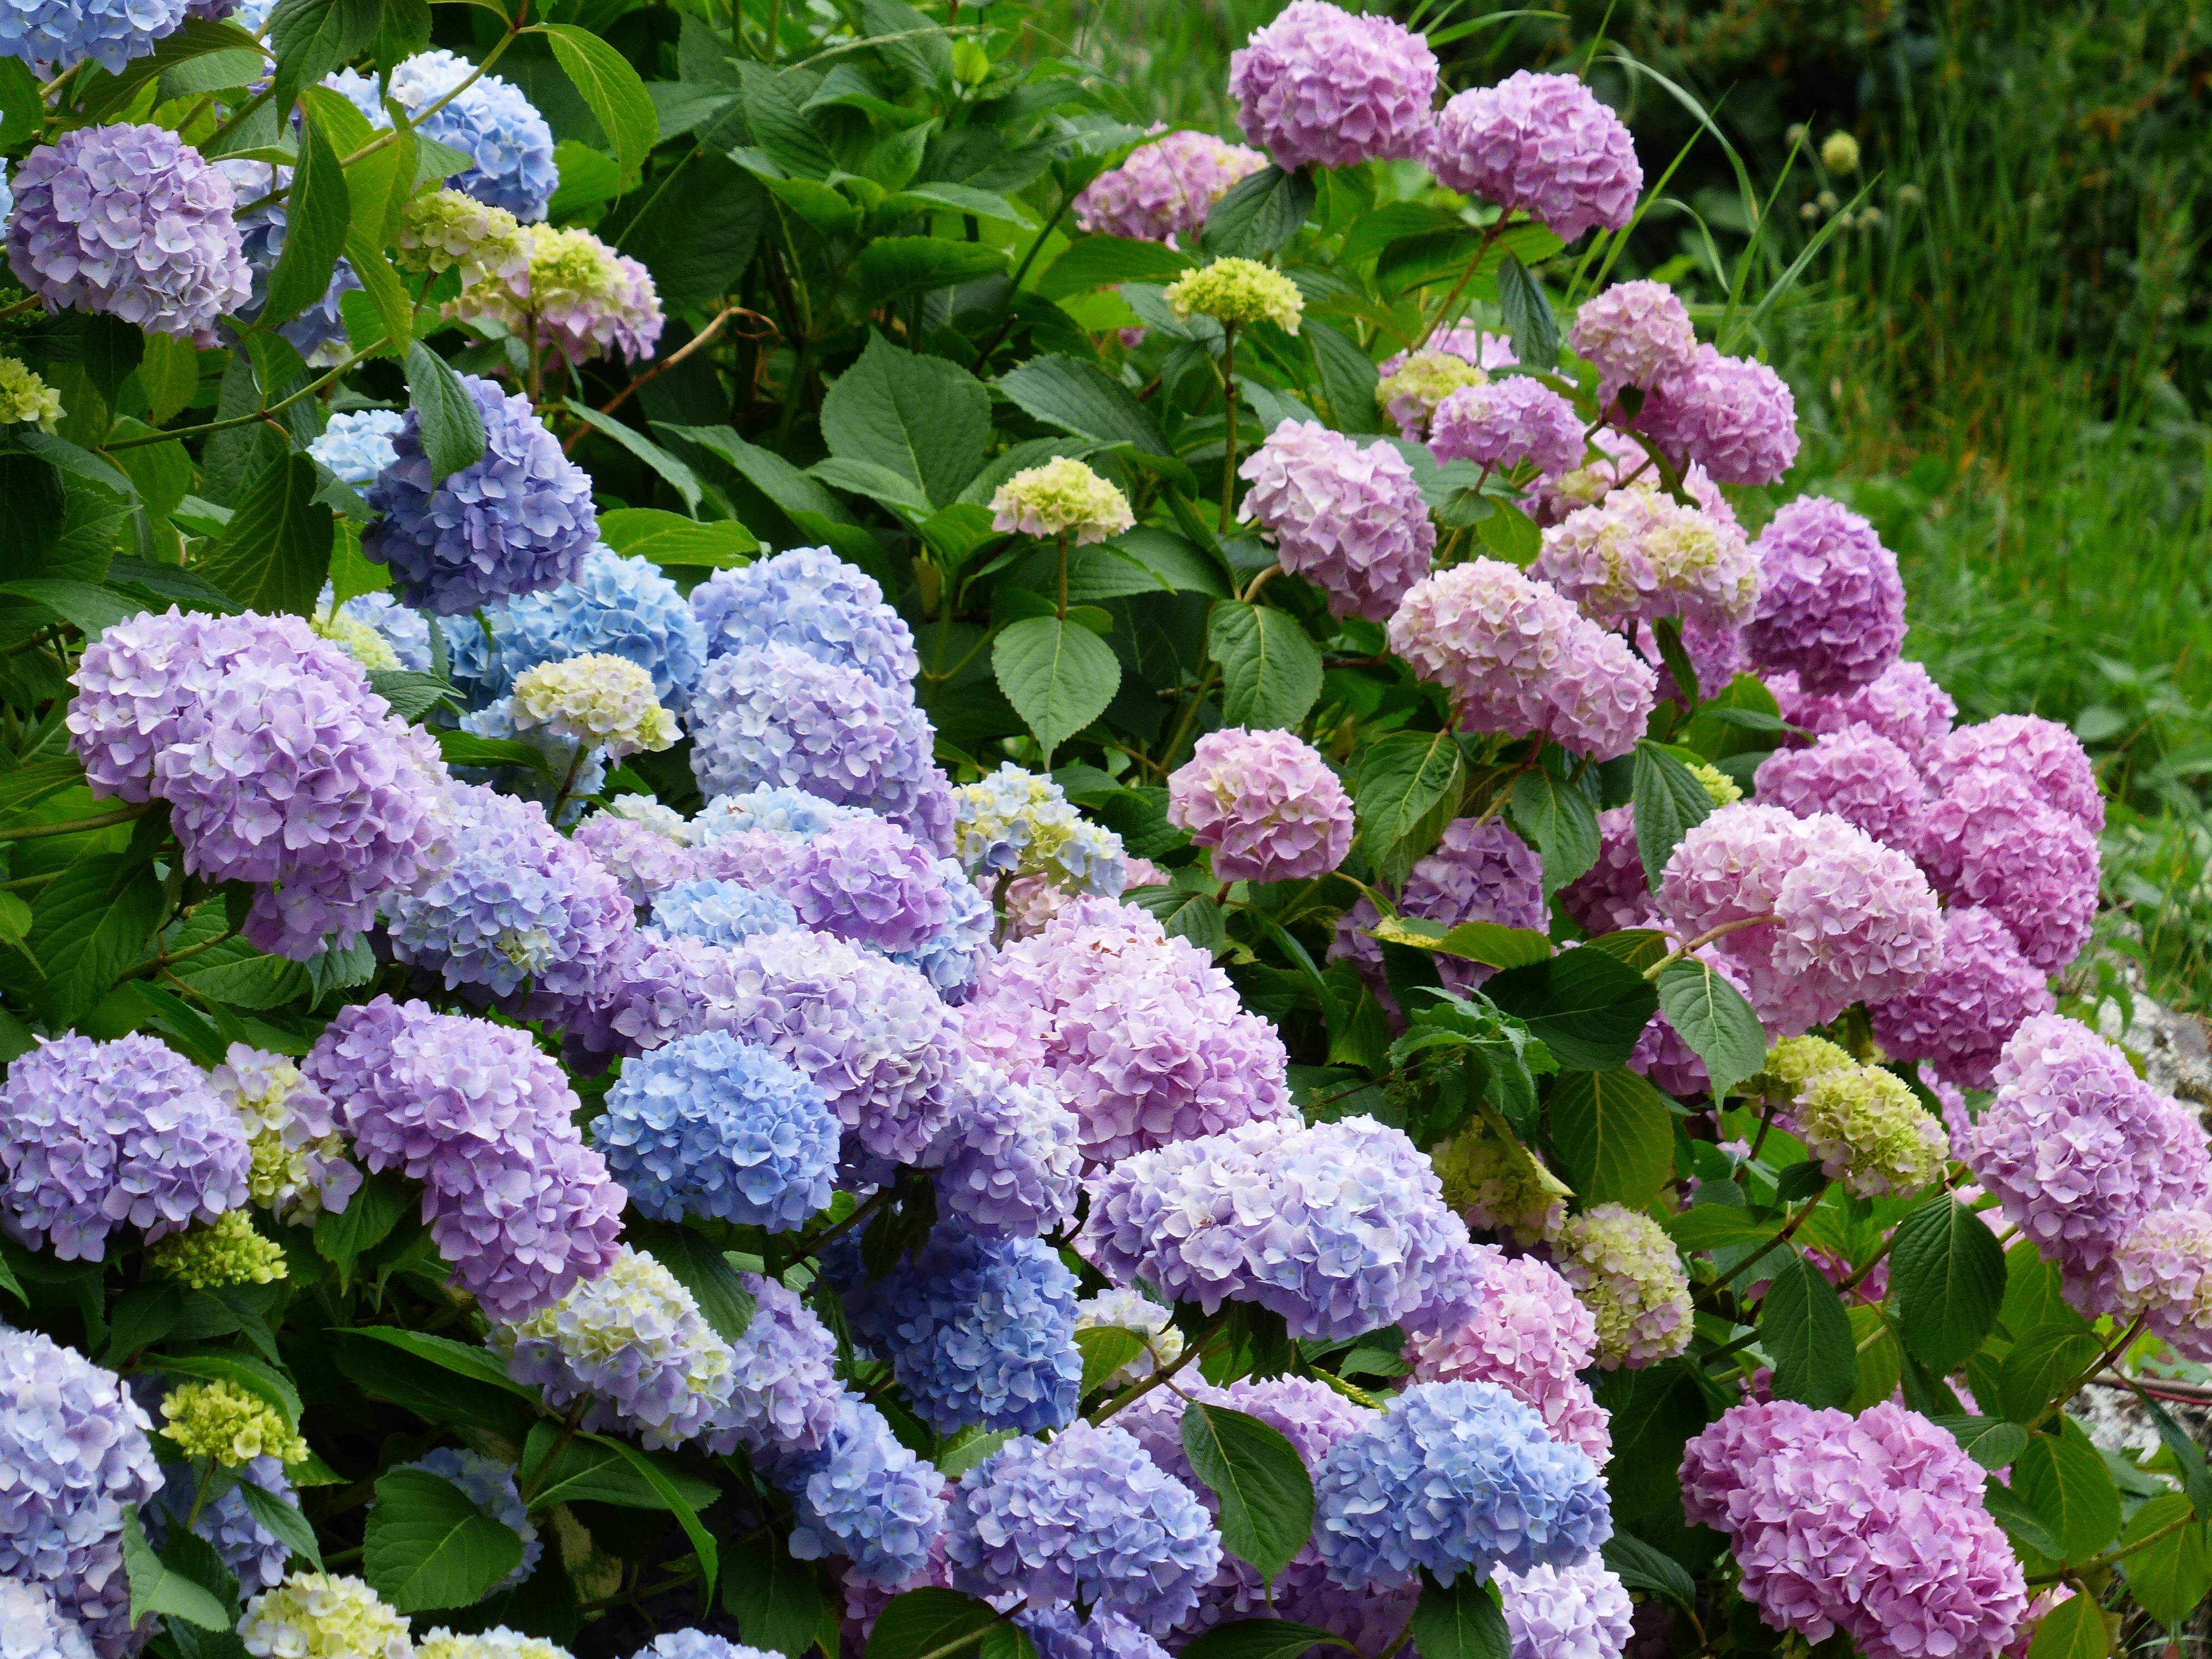 Free Images Blossom Flower Purple Bloom Bush Blue Pink